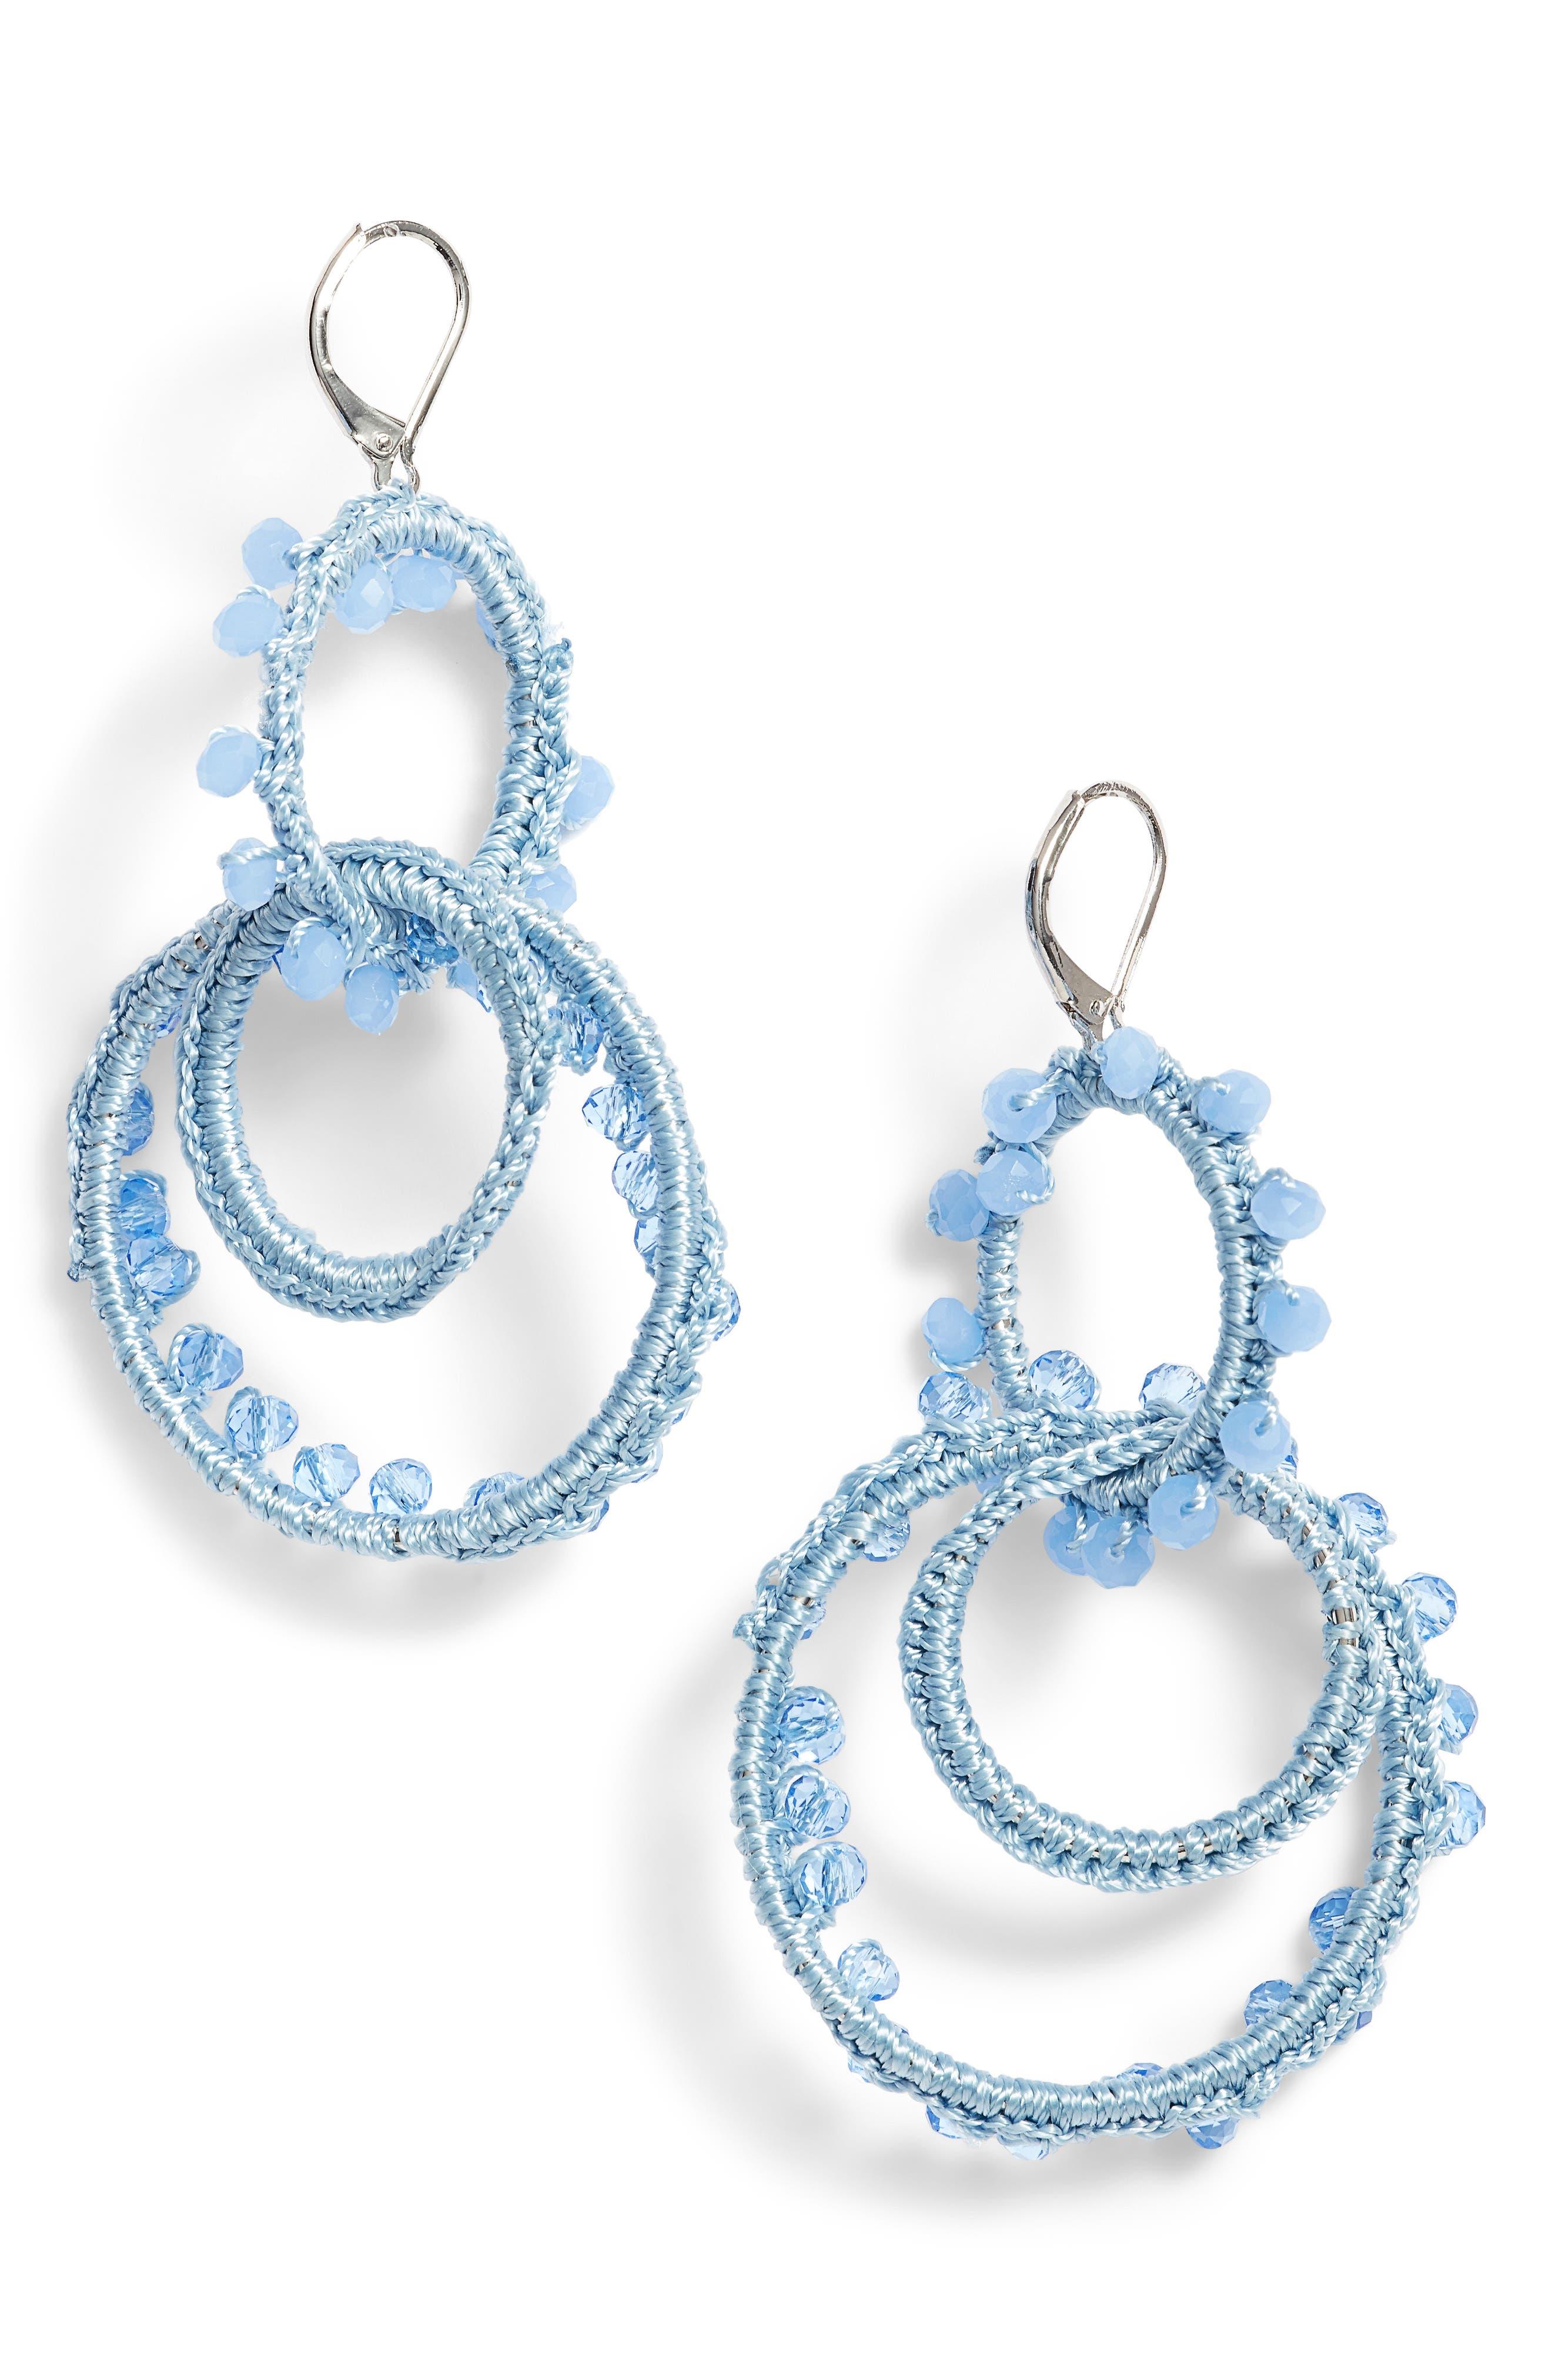 Thread Wrapped Interlocking Hoop Earrings,                         Main,                         color, Blue/ Silver